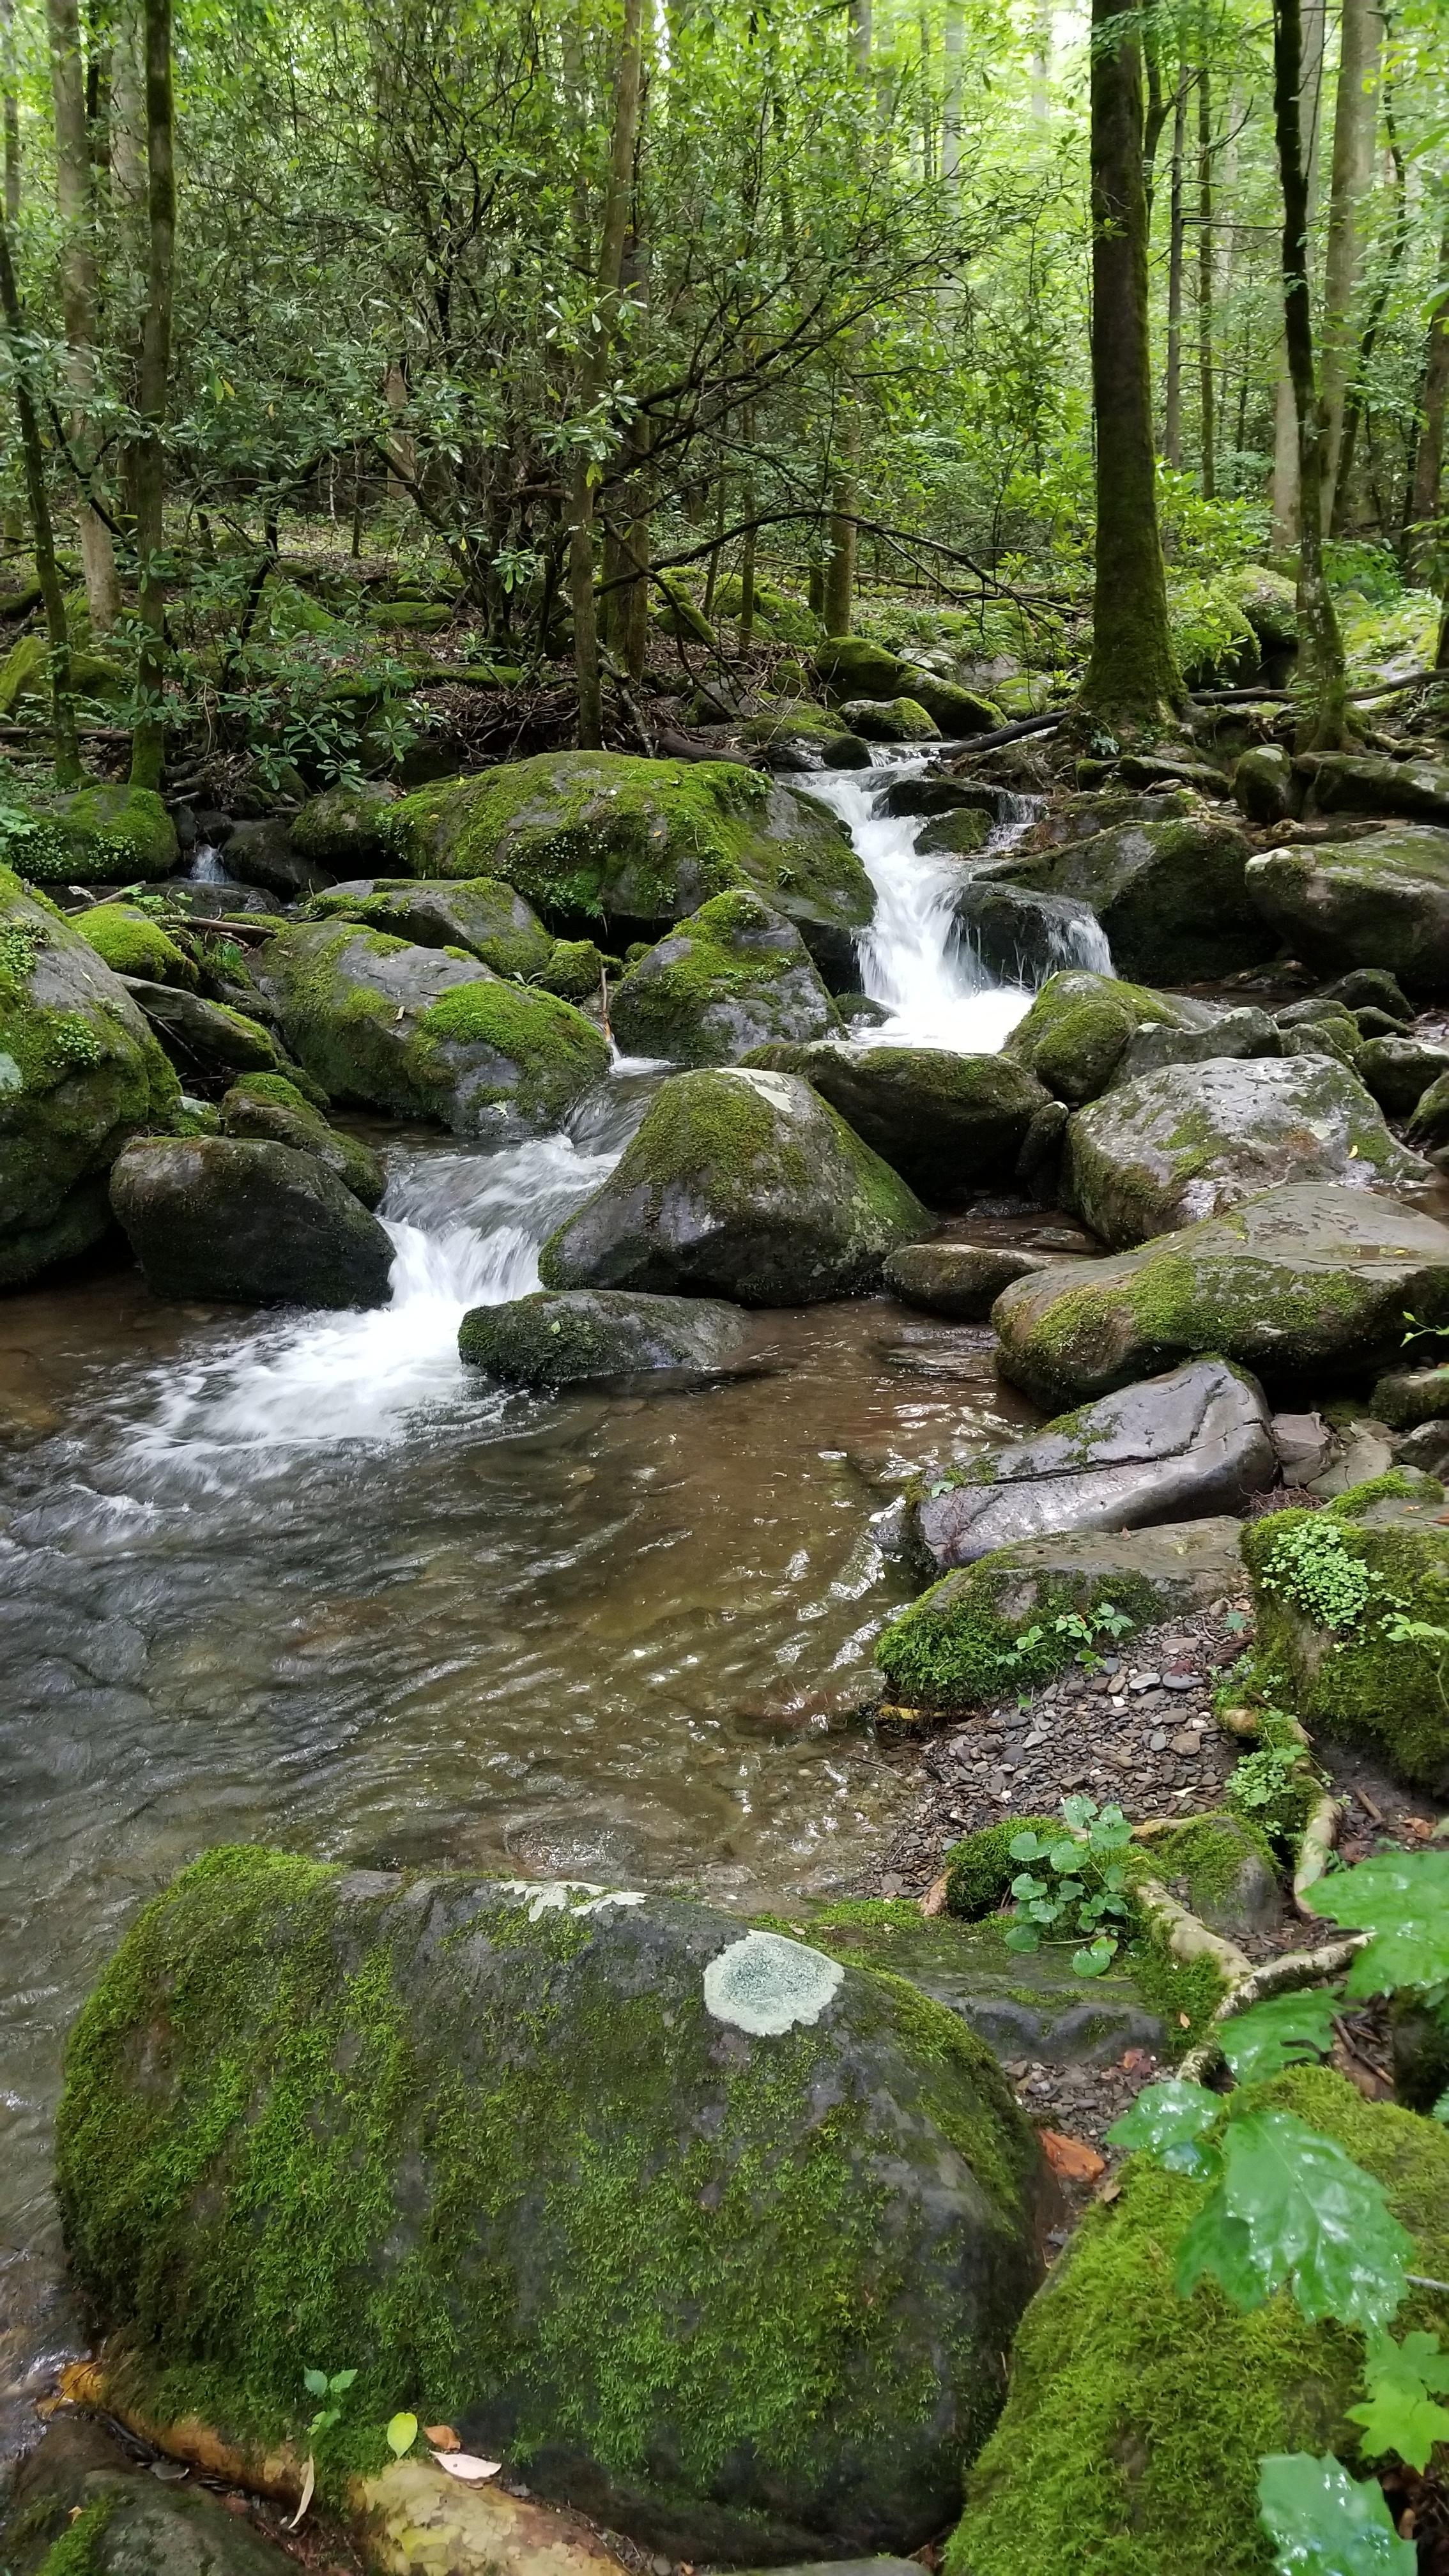 Big Creek Great Smoky Mountains National Park